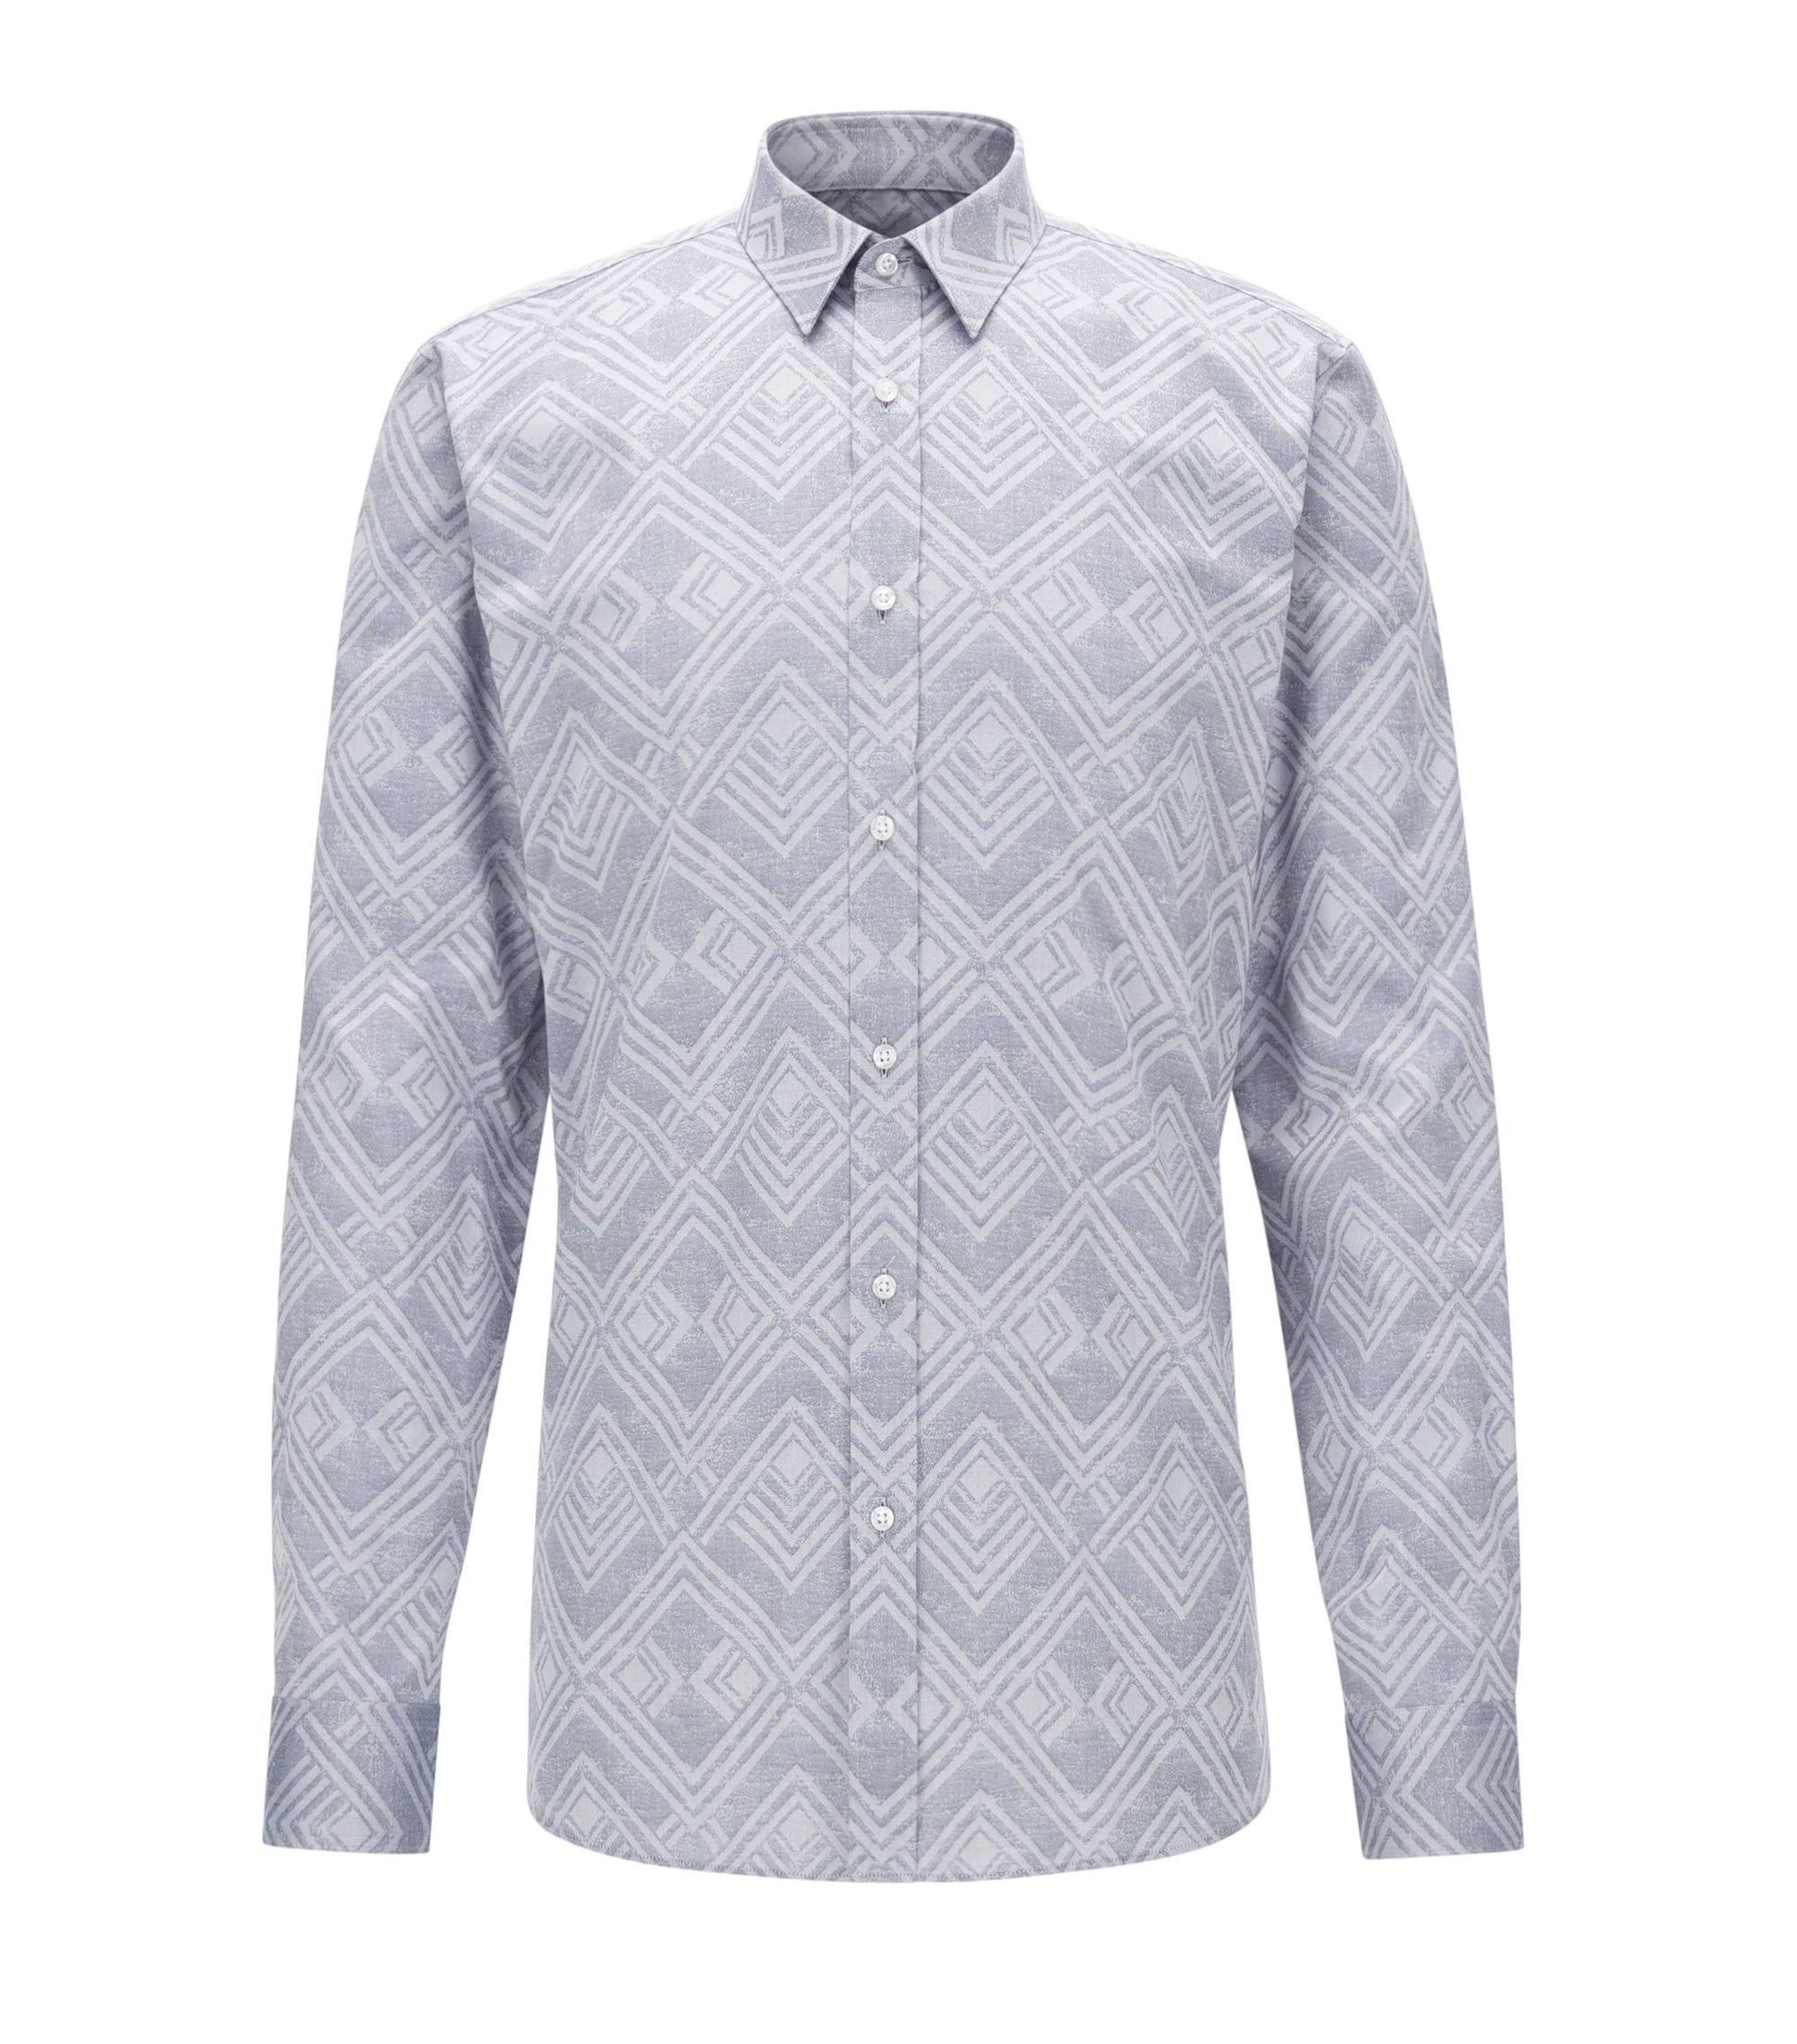 Jacquard Cotton Button Down Shirt, Extra Slim Fit | Elisha, Open Grey